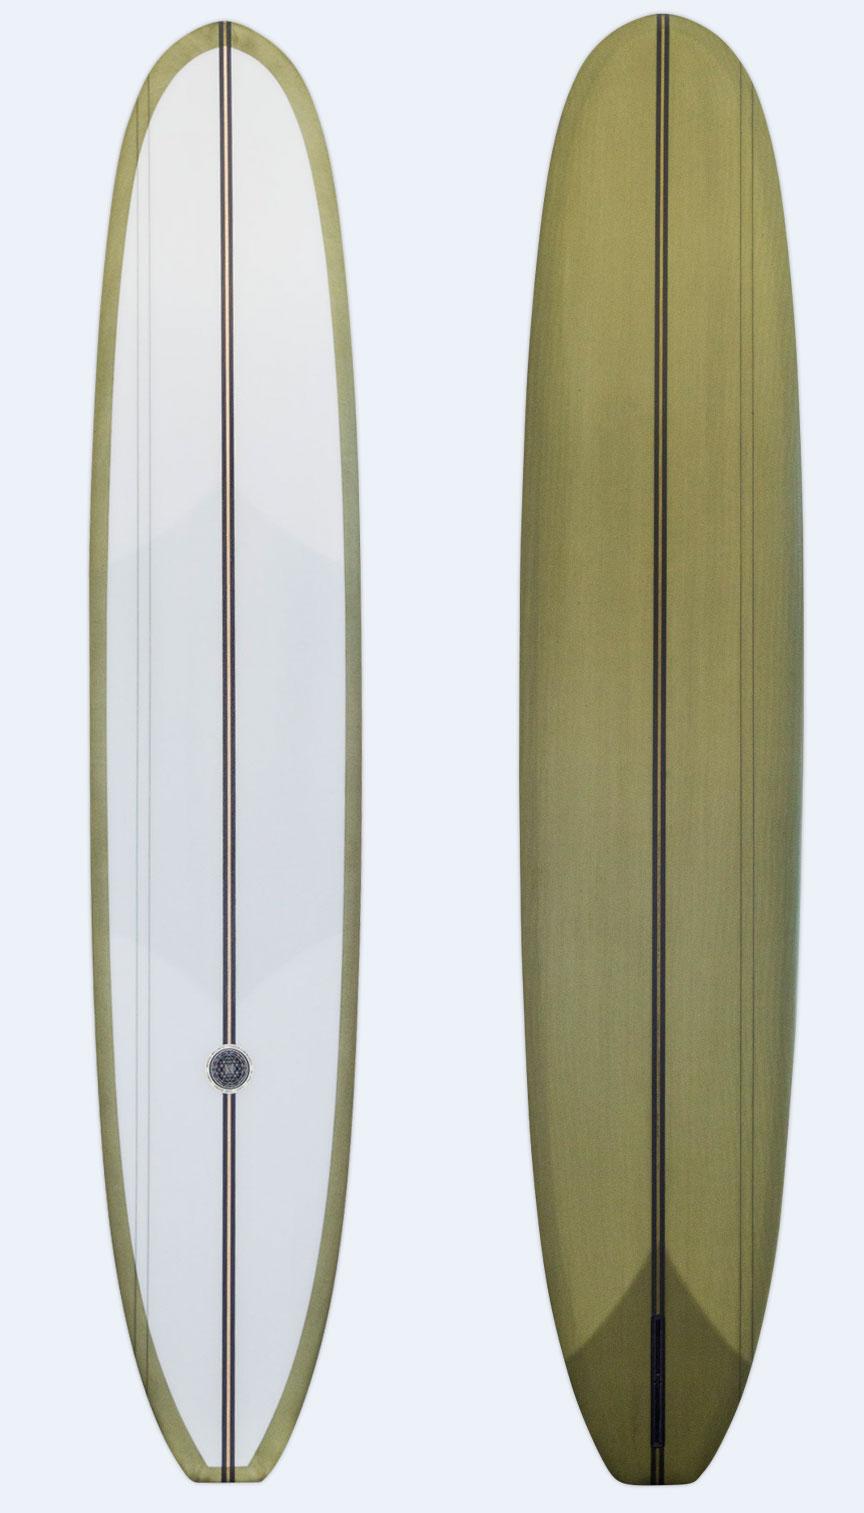 tudor-surfboards-modelt